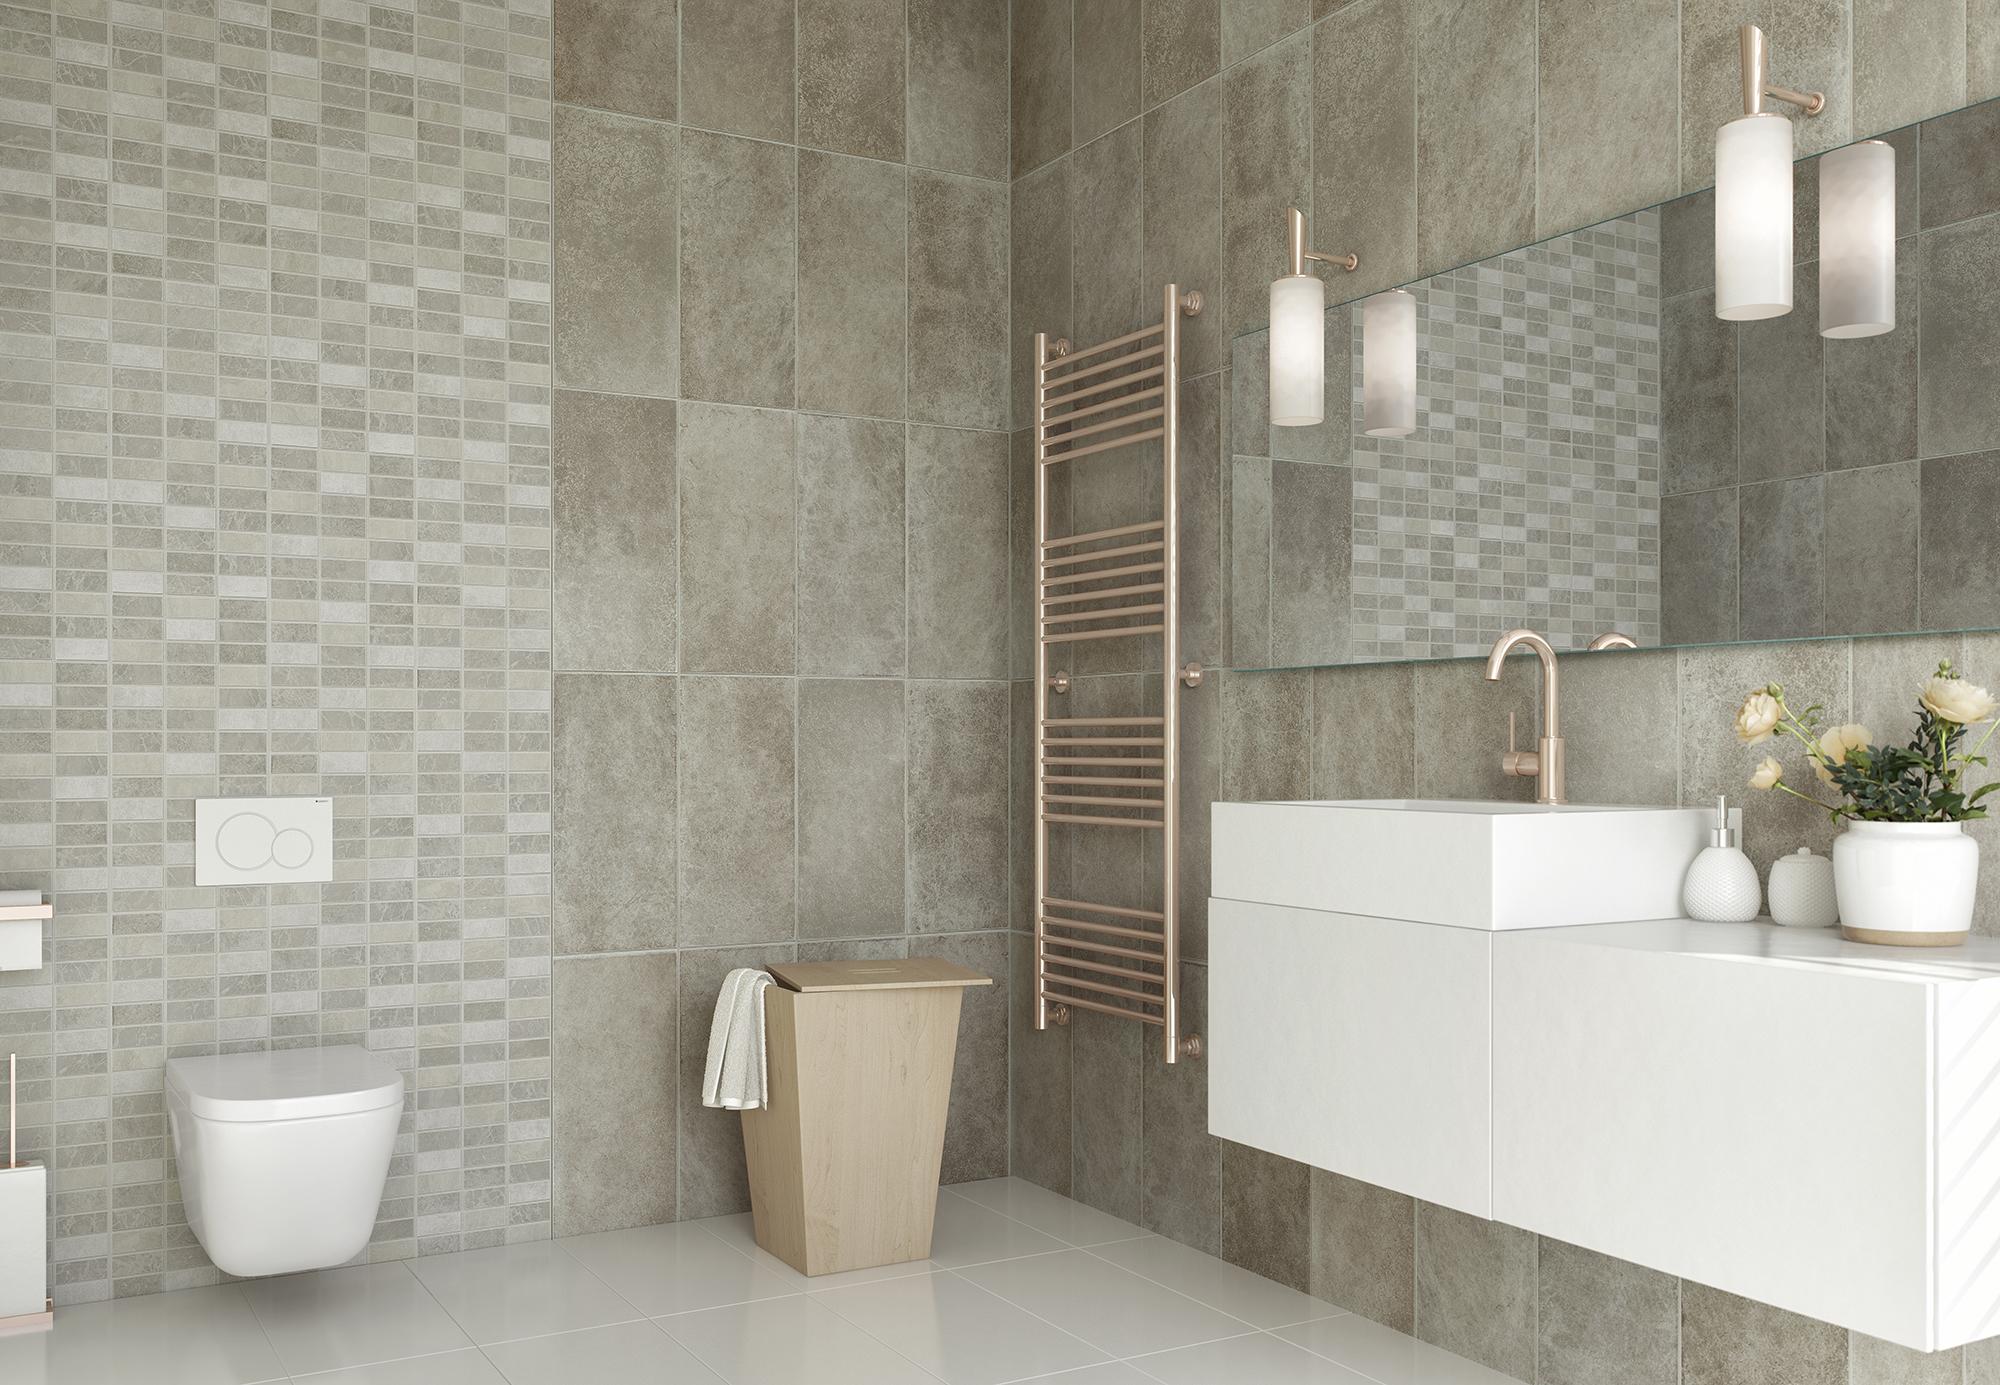 Bathroom Cladding Archives - Decor Cladding Direct